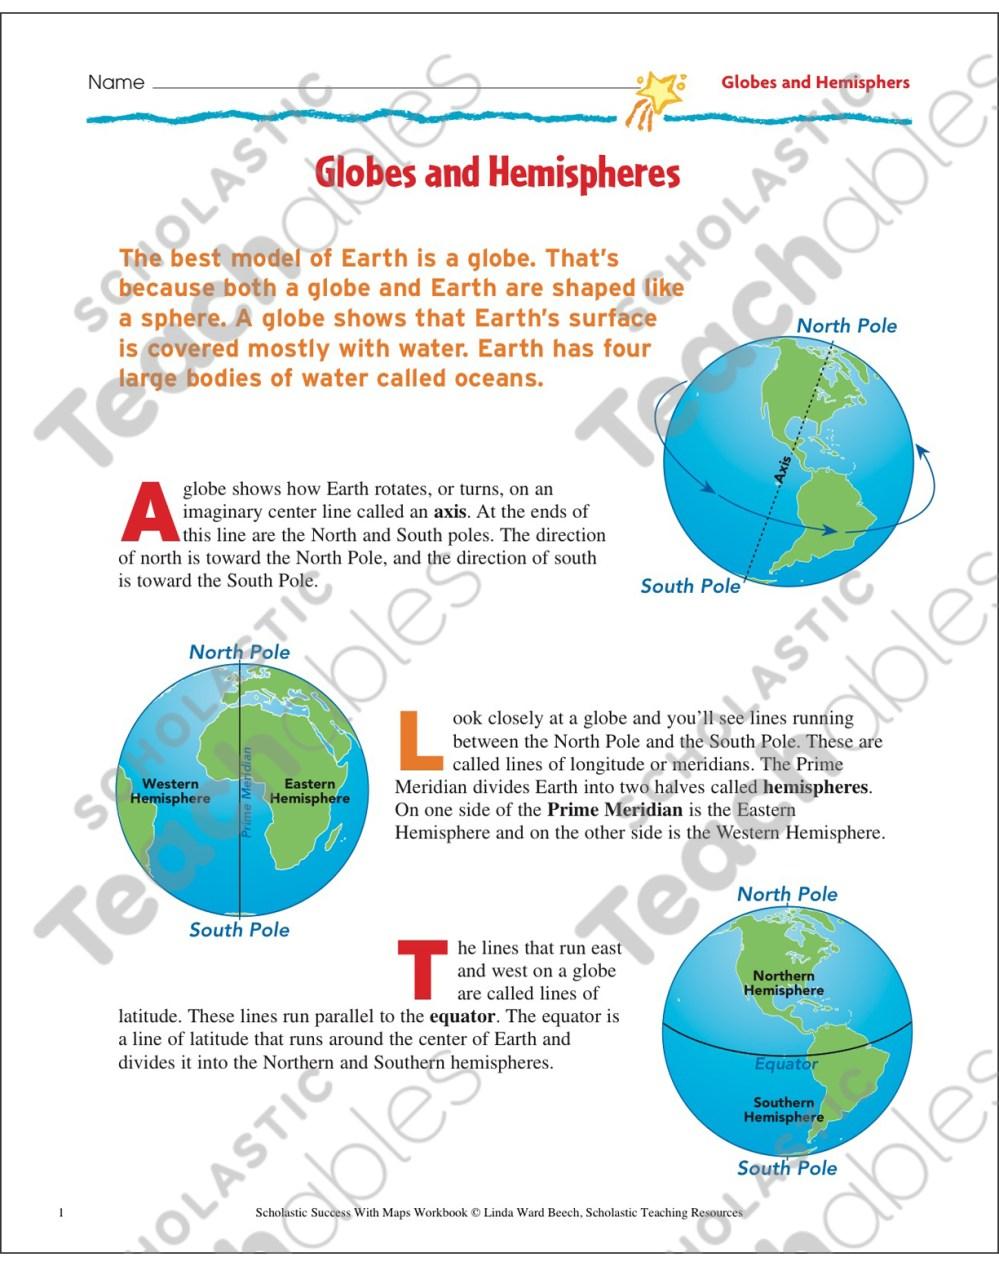 medium resolution of Happy Hemispheres Worksheet Answers - Nidecmege